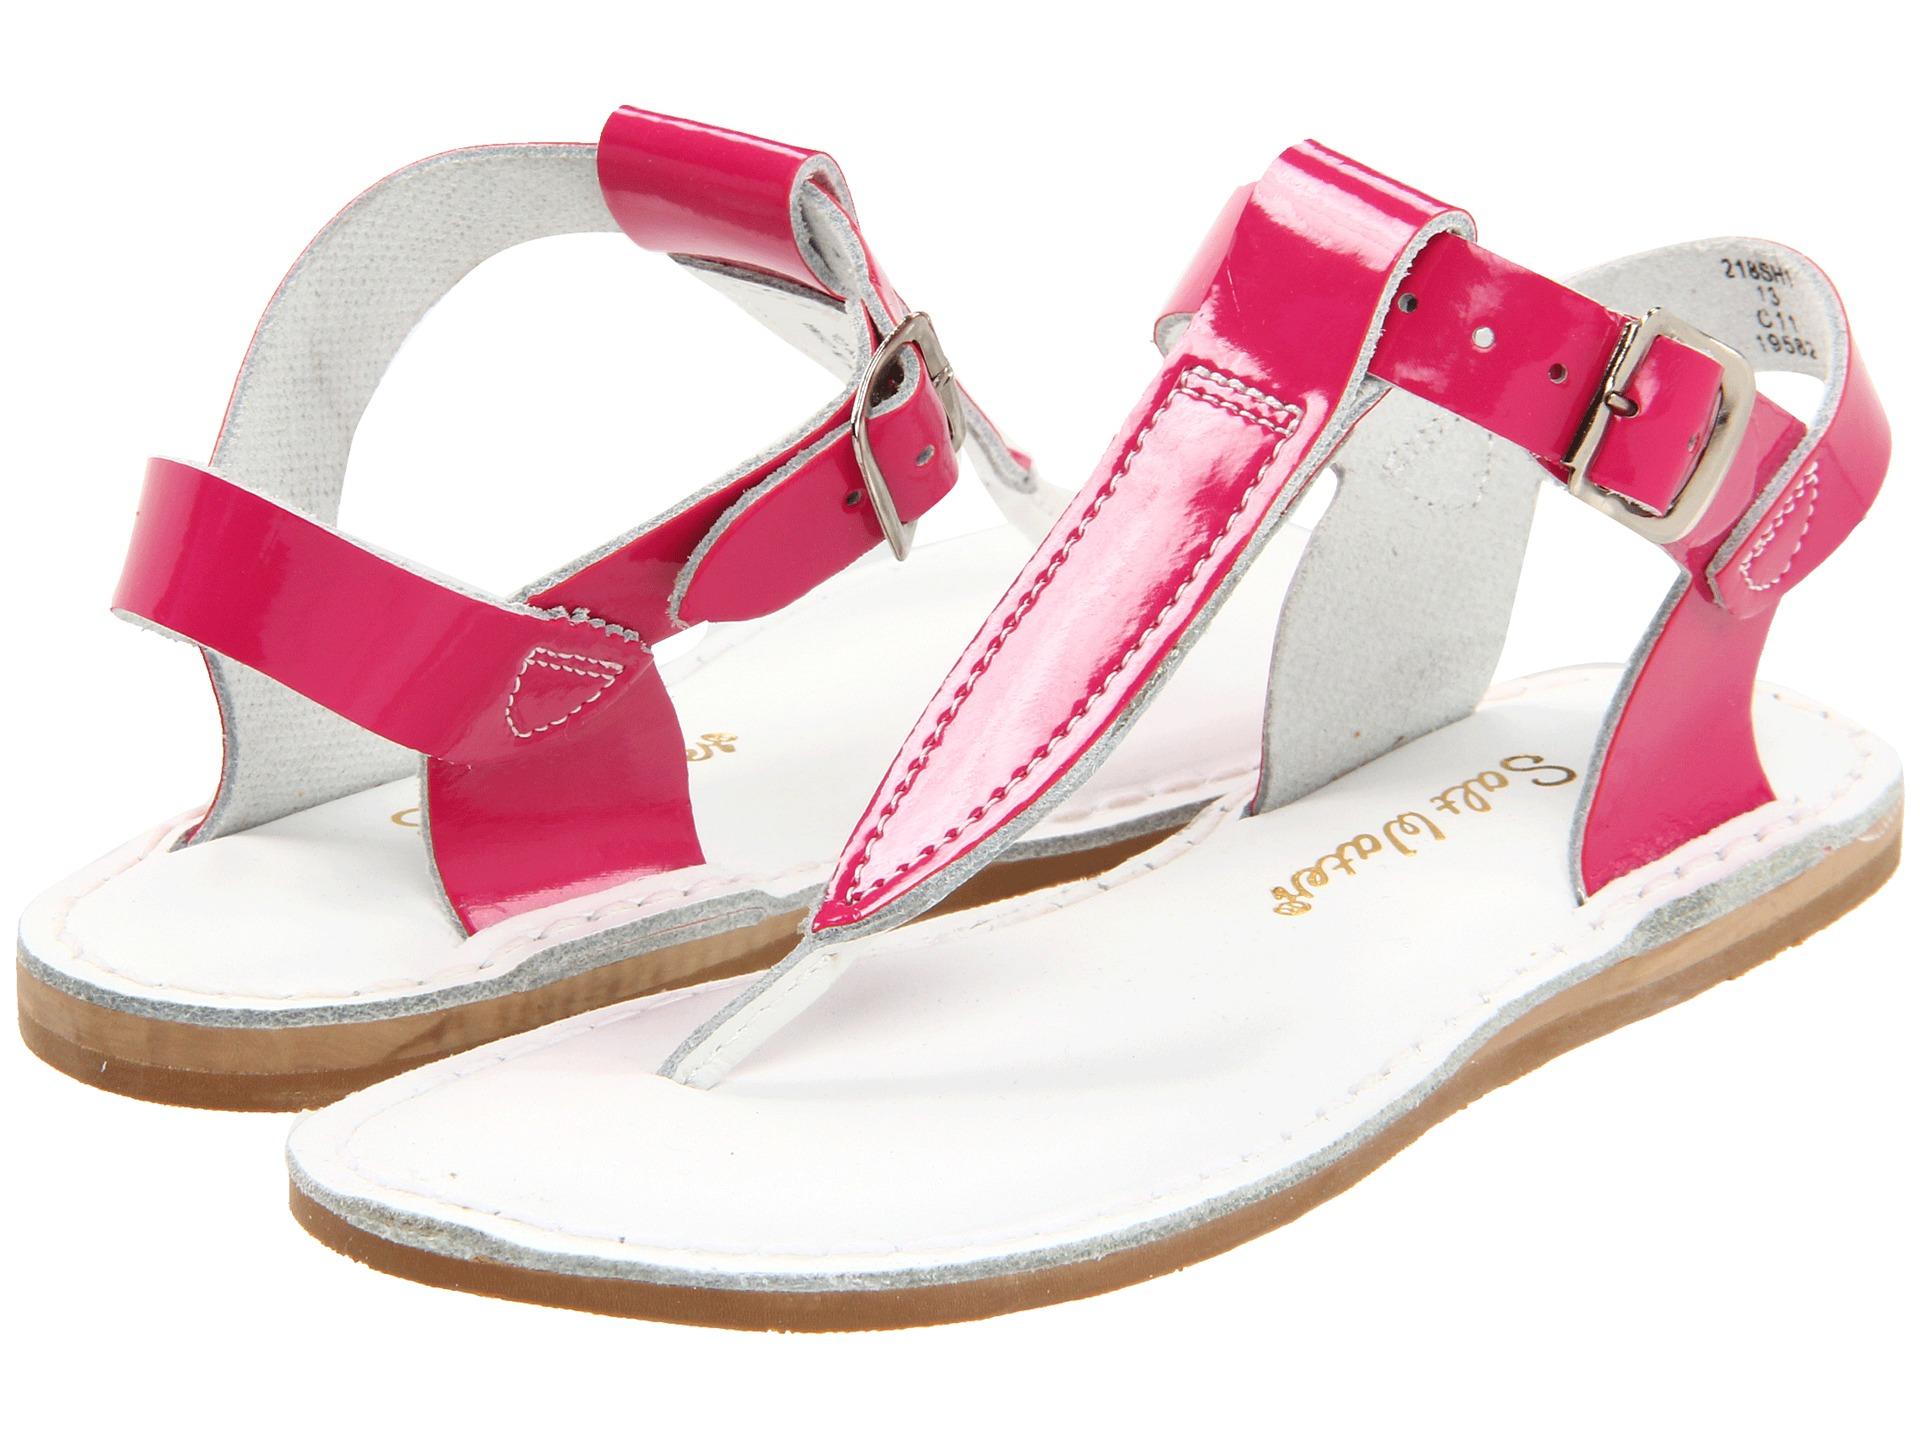 Salt Water Sandal By Hoy Shoes Sun San T Thongs Toddler